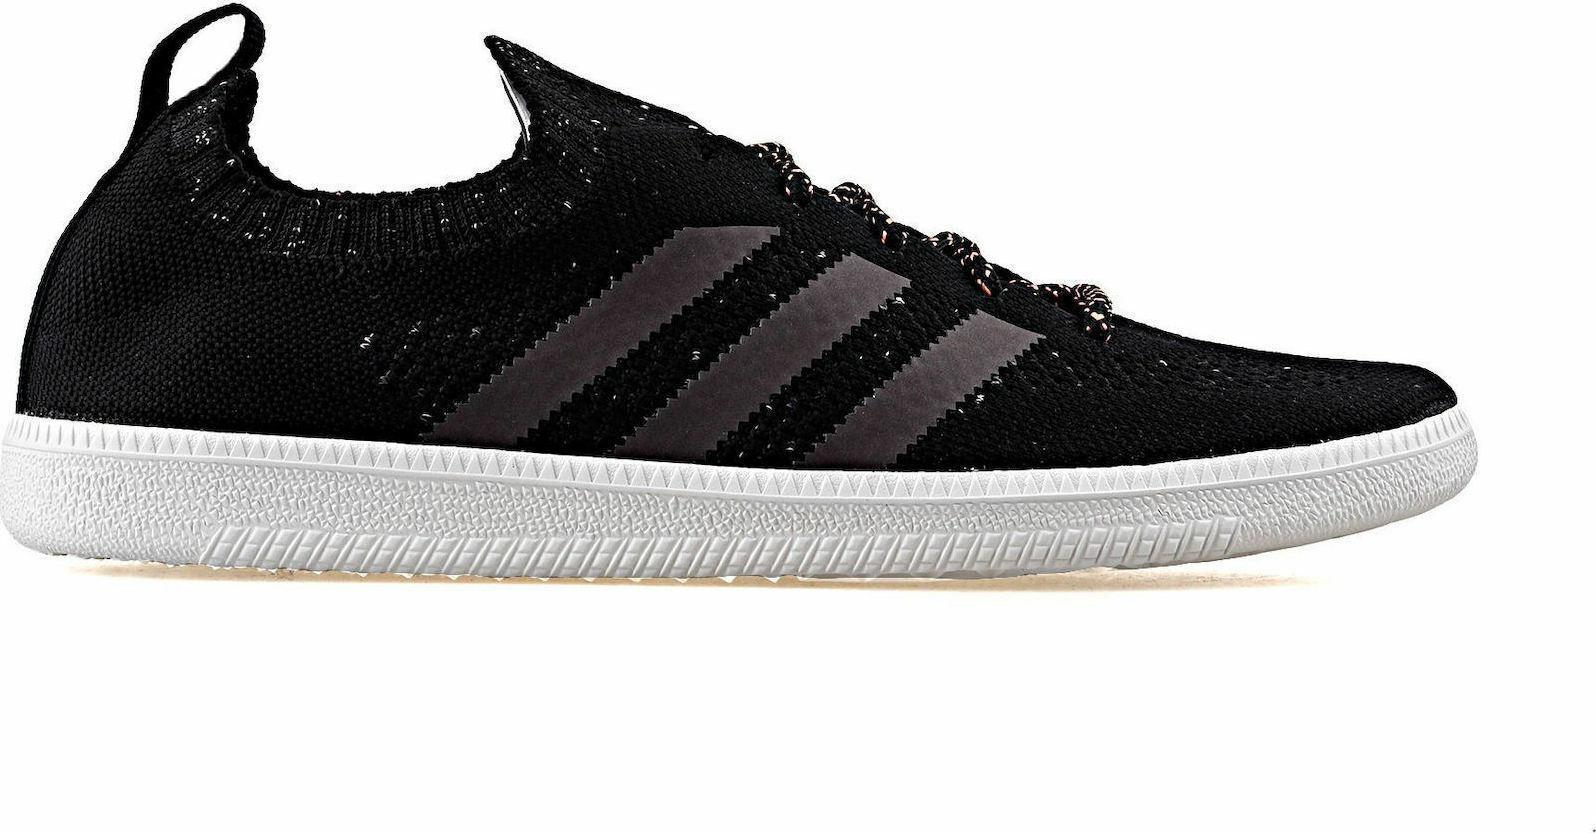 Adidas samba PK primeknit Sock nuevo negro b41551 gr 48 Superstar gacela